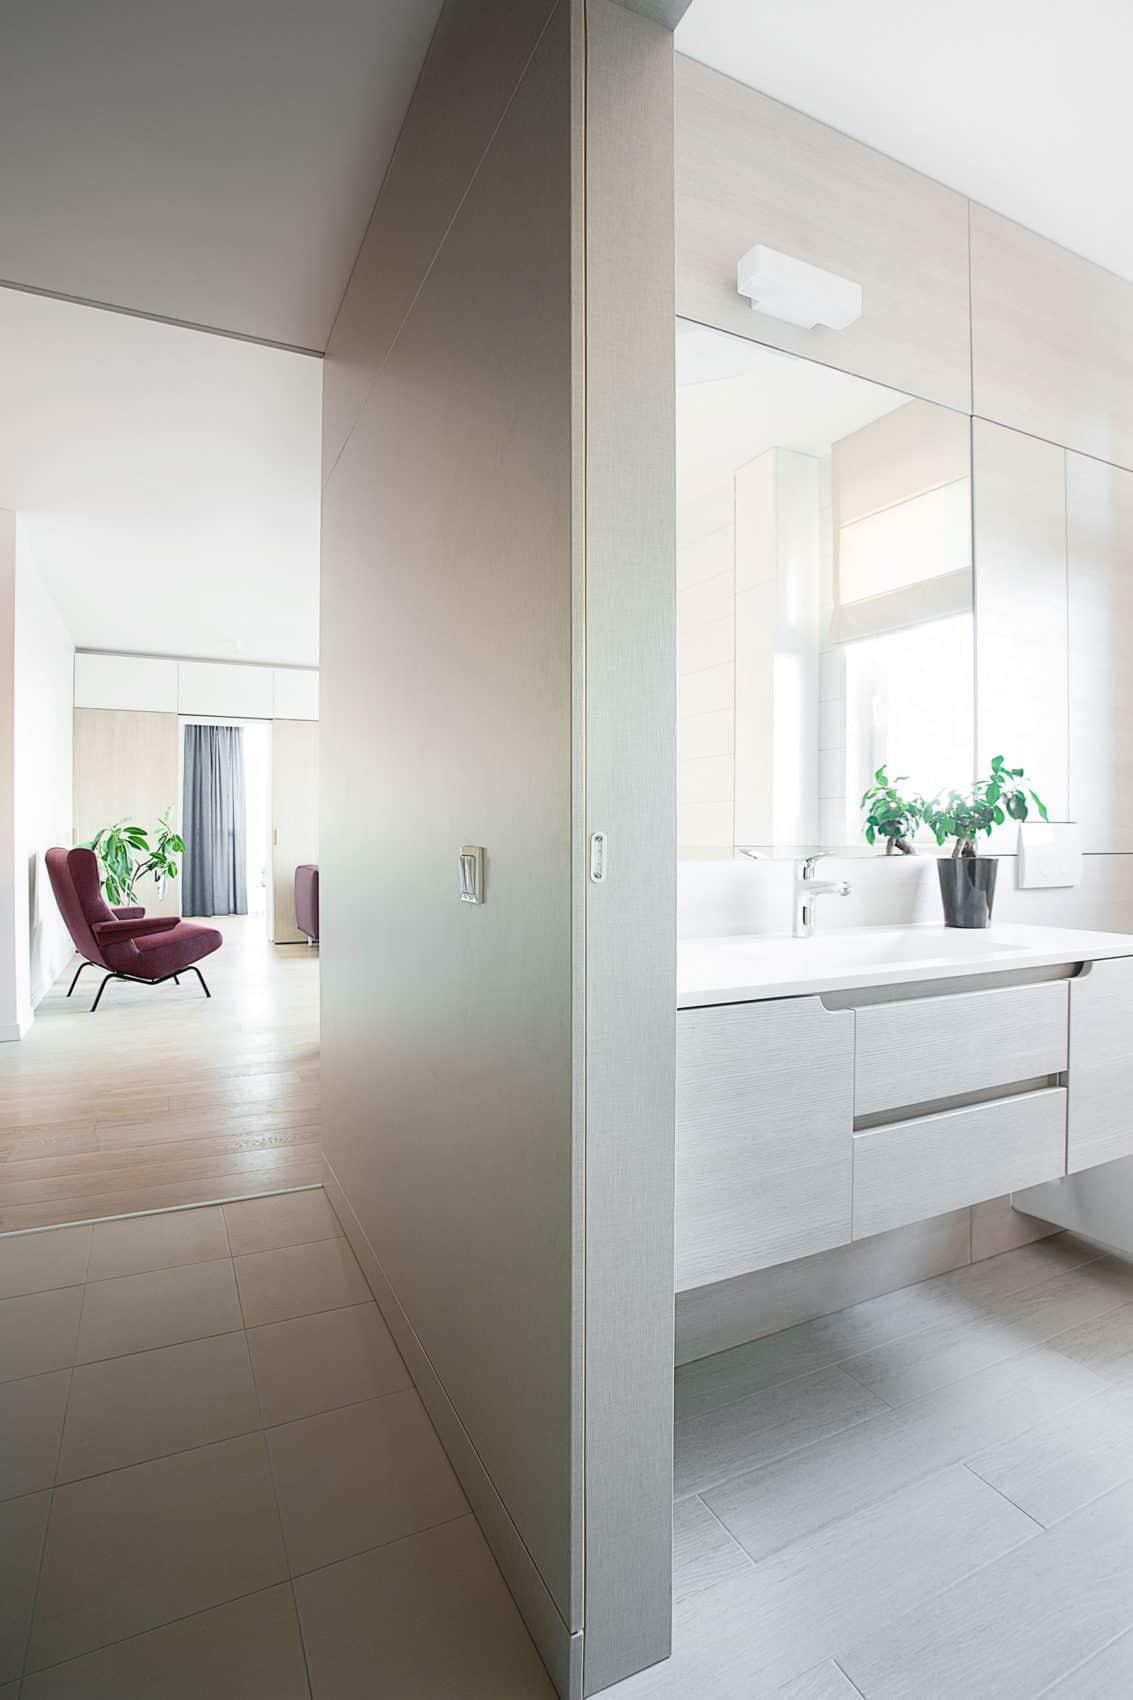 Apartment in Vilnius 2 by Normundas Vilkas (10)